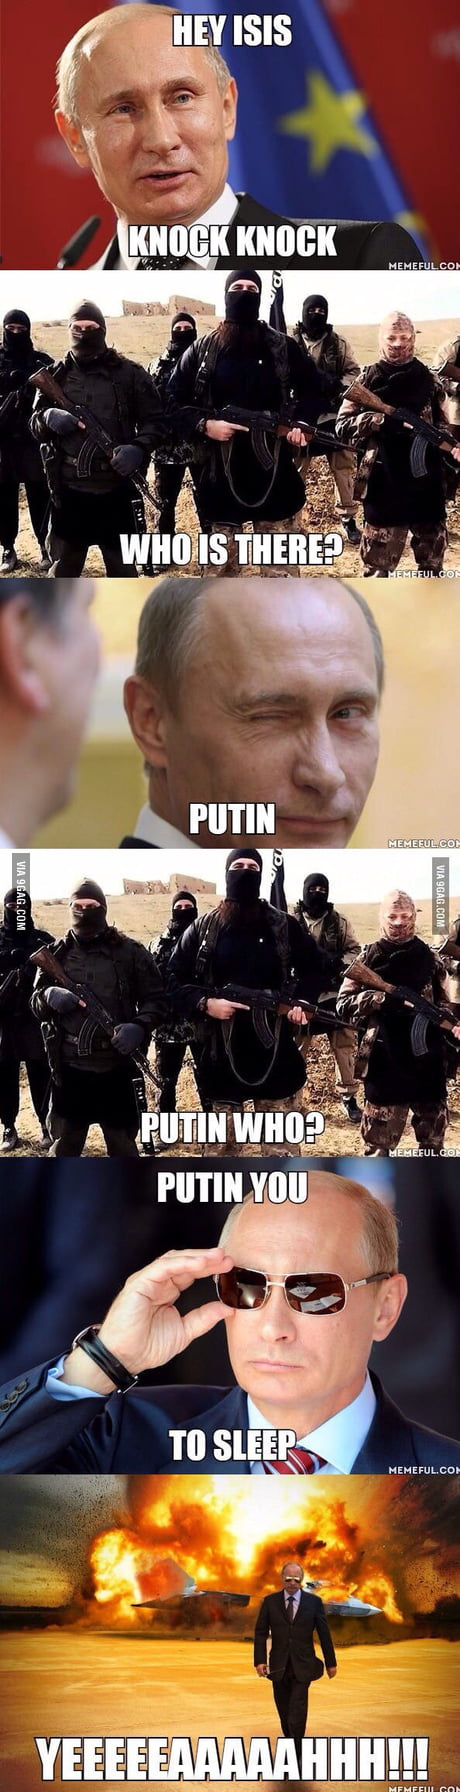 Putin who?